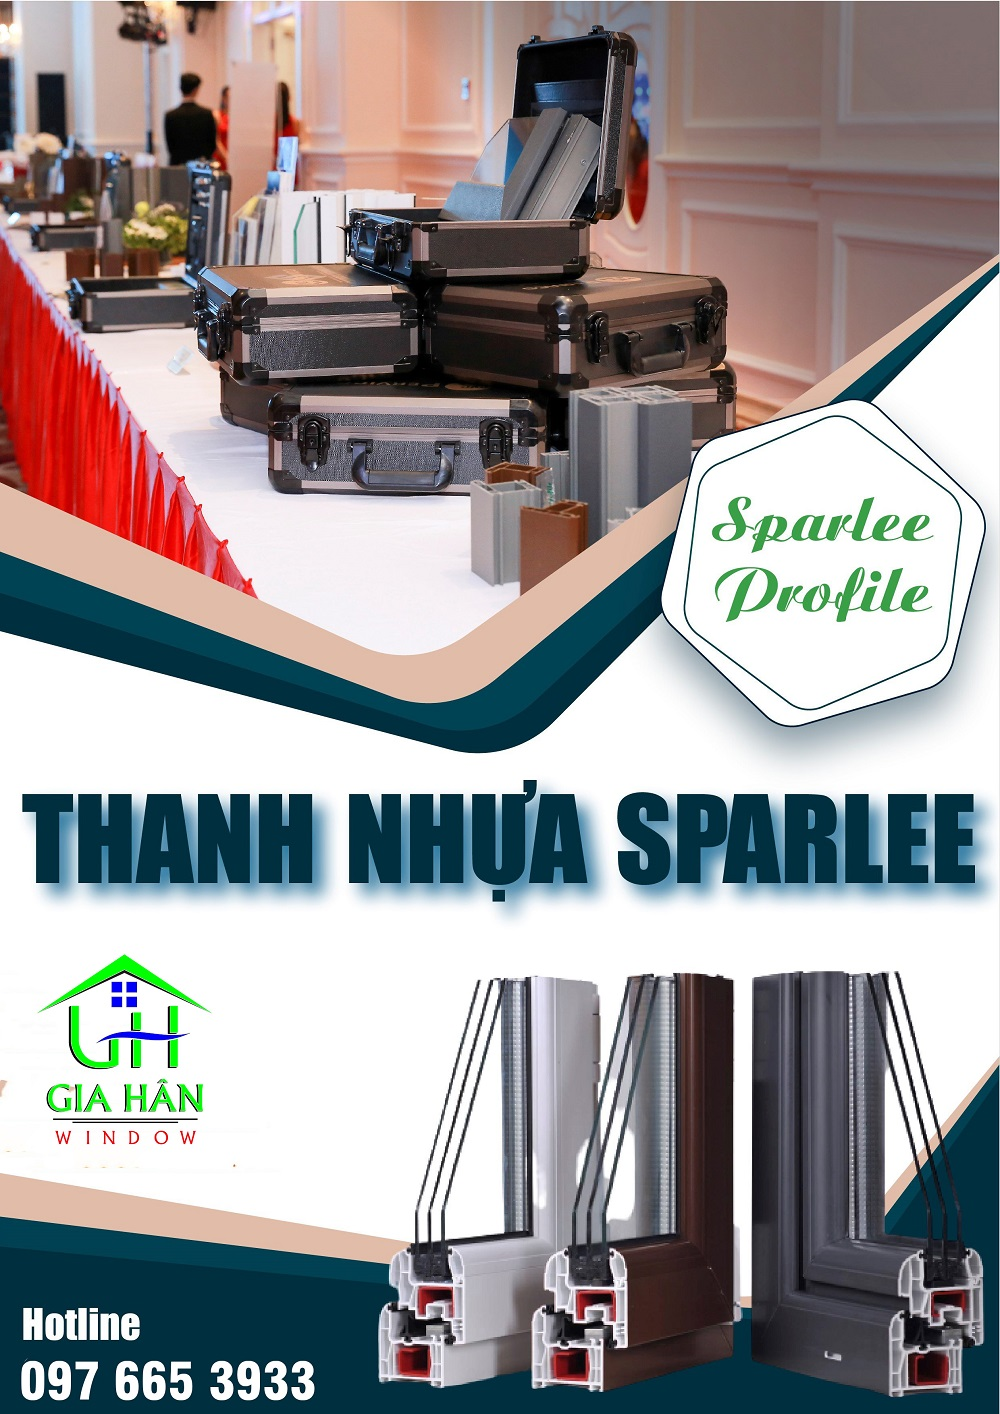 Thanh Nhua Sparklee 12